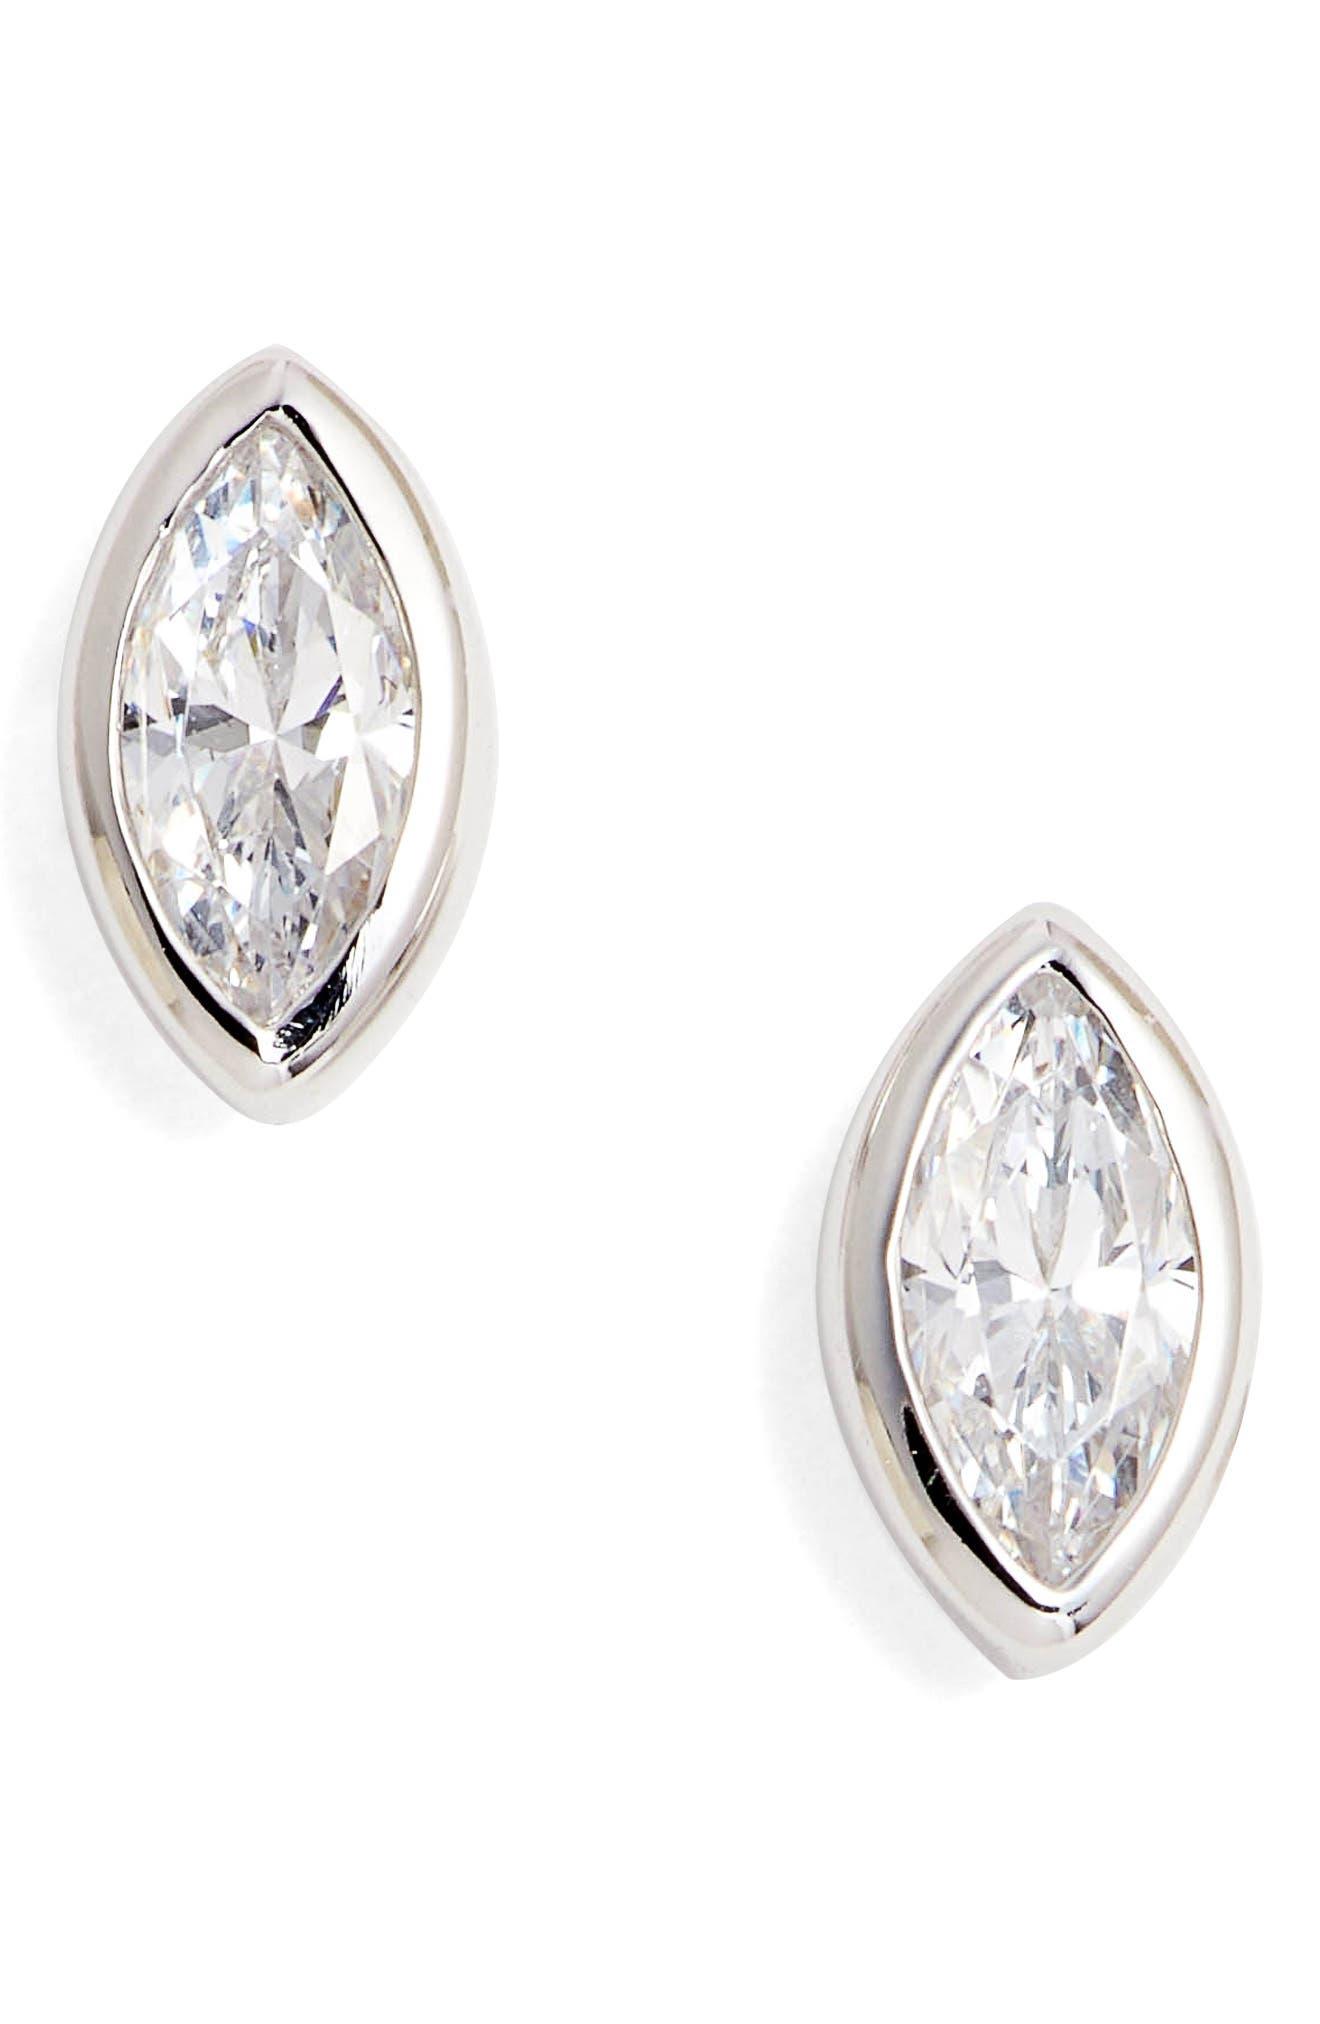 Bezel-Set Marquise-Cut Stud Earrings,                         Main,                         color, SILVER/ CLEAR